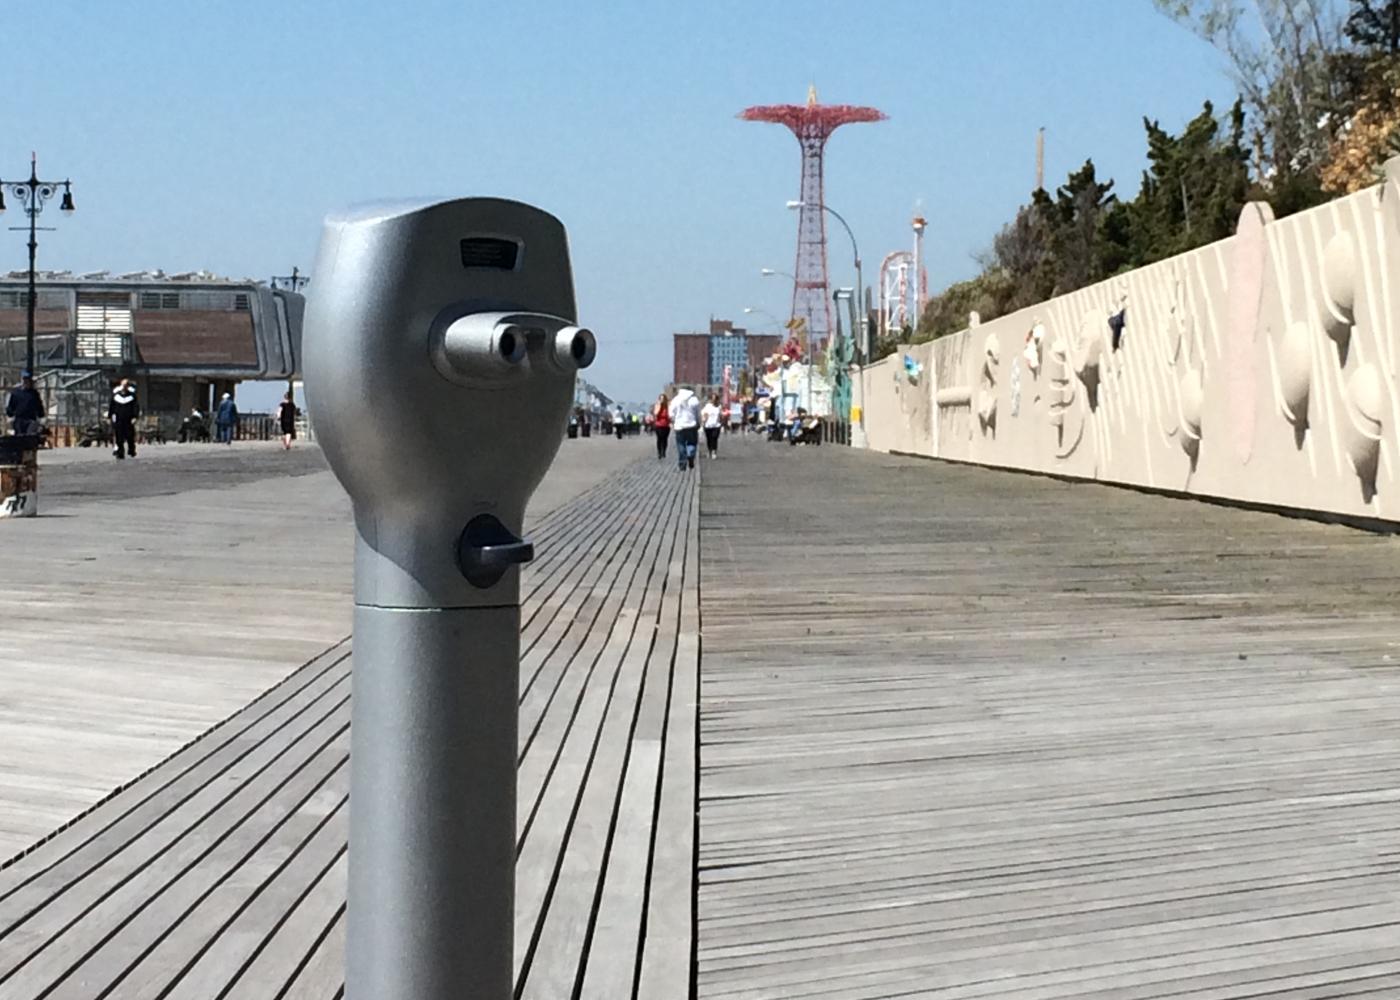 NY Aquarium - On the iconic Coney Island Boardwalk